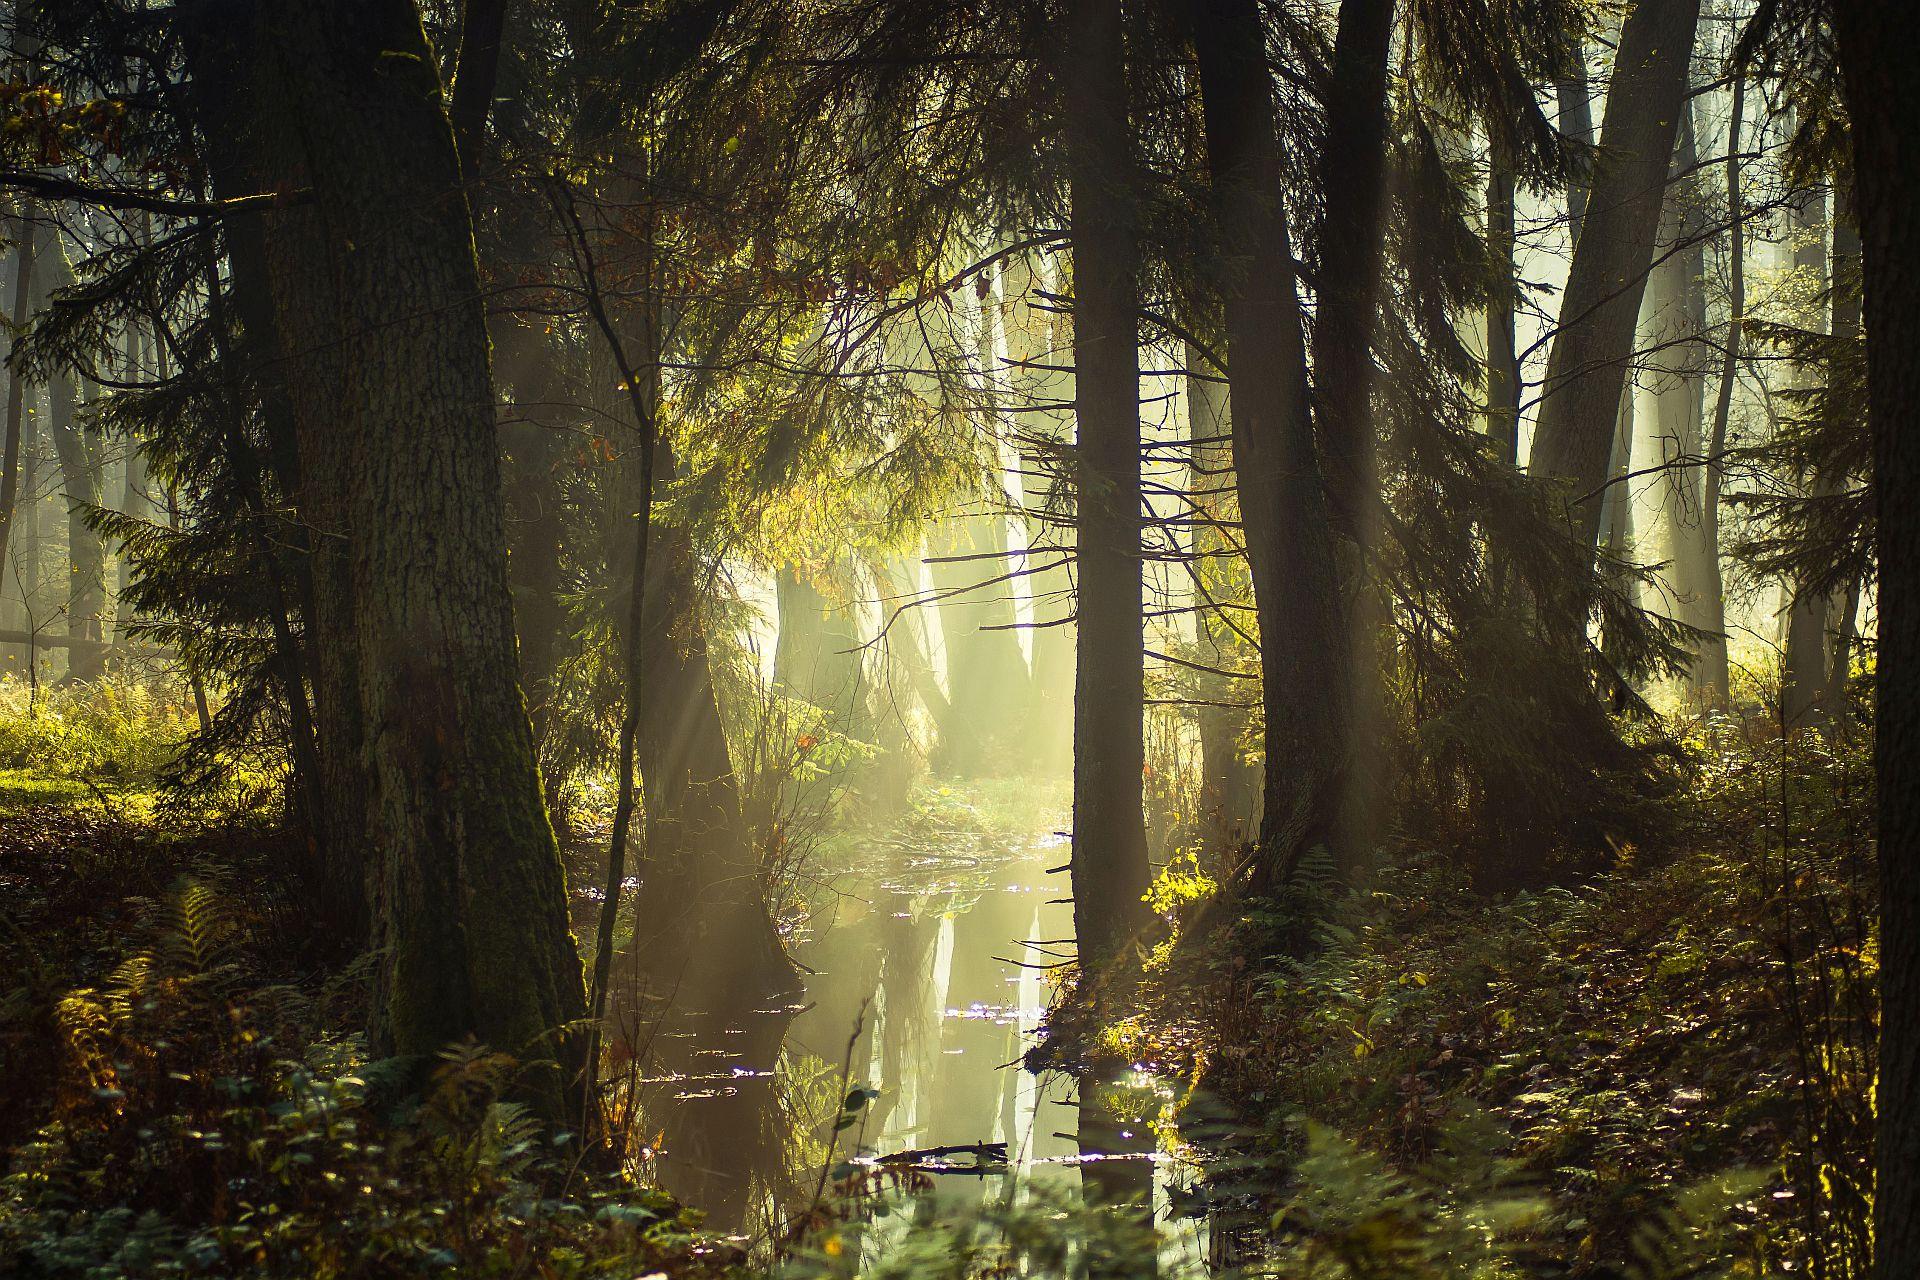 dawn,fog,trees,water,sky,light,landscape,nature,nikon,mist,forest,, Tollas Krzysztof